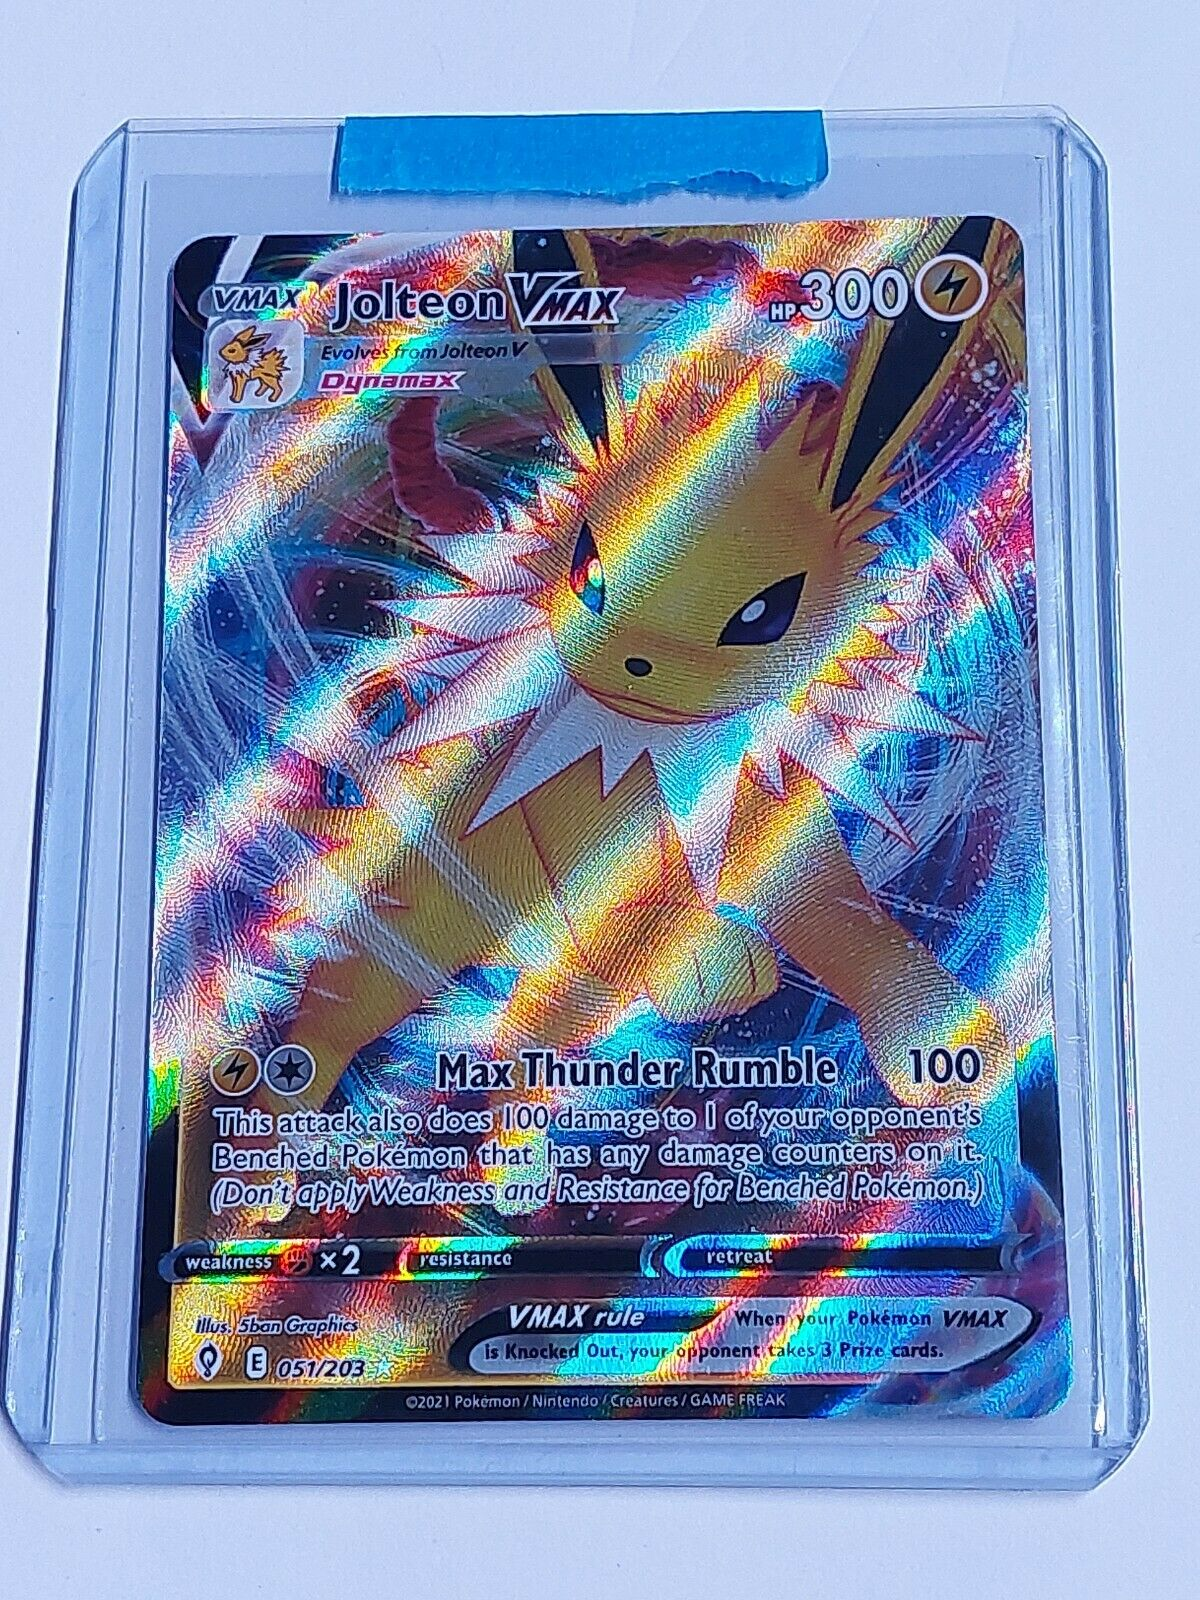 Pokémon Evolving Skies Jolteon Vmax Full Art 051/203